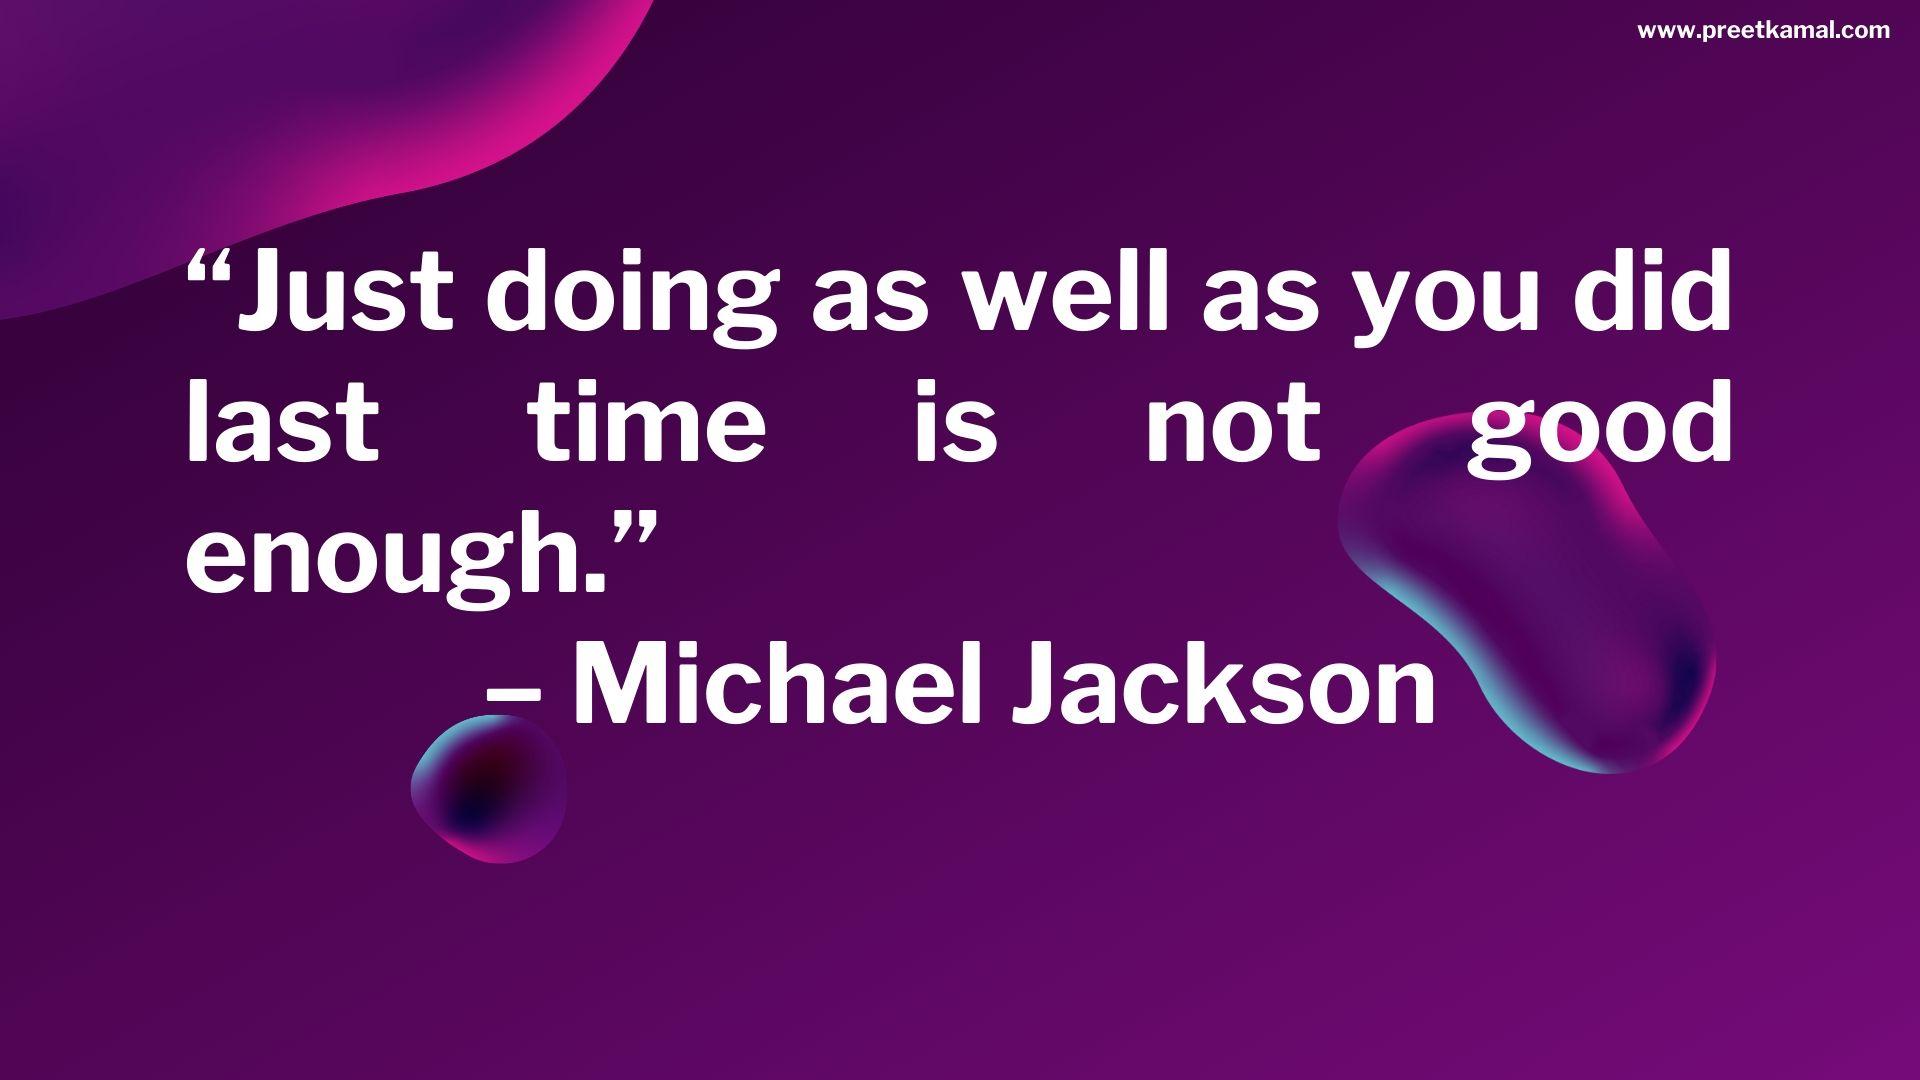 Michael Jackson Quotes (9)